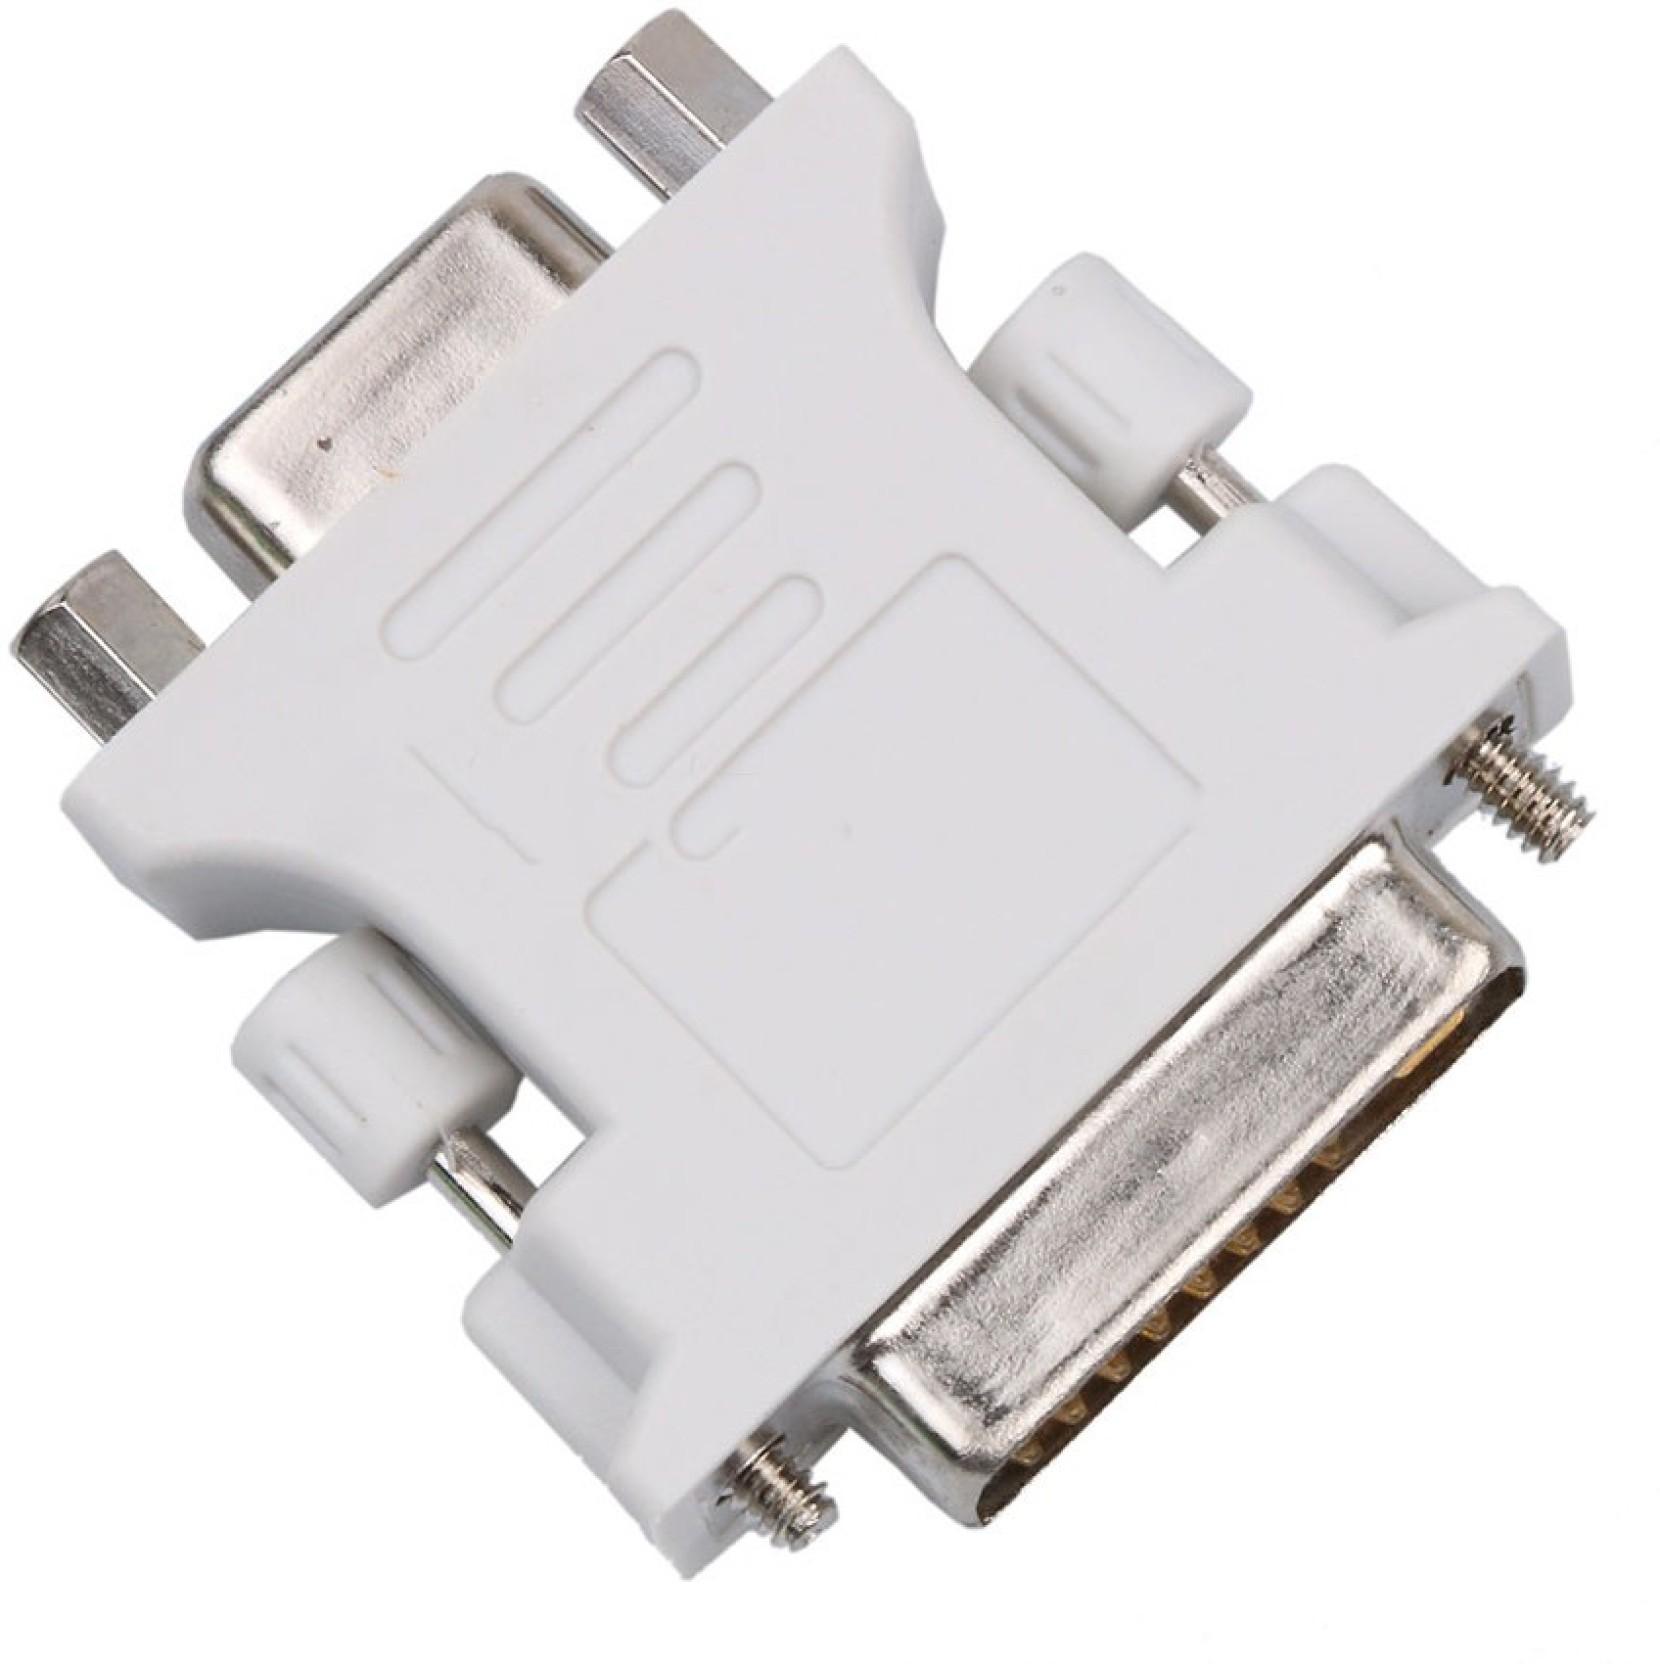 DVI-I 24+5 Pin Male To HD15 Pin VGA Female Adapter Convertor M to F DVI I to VGA